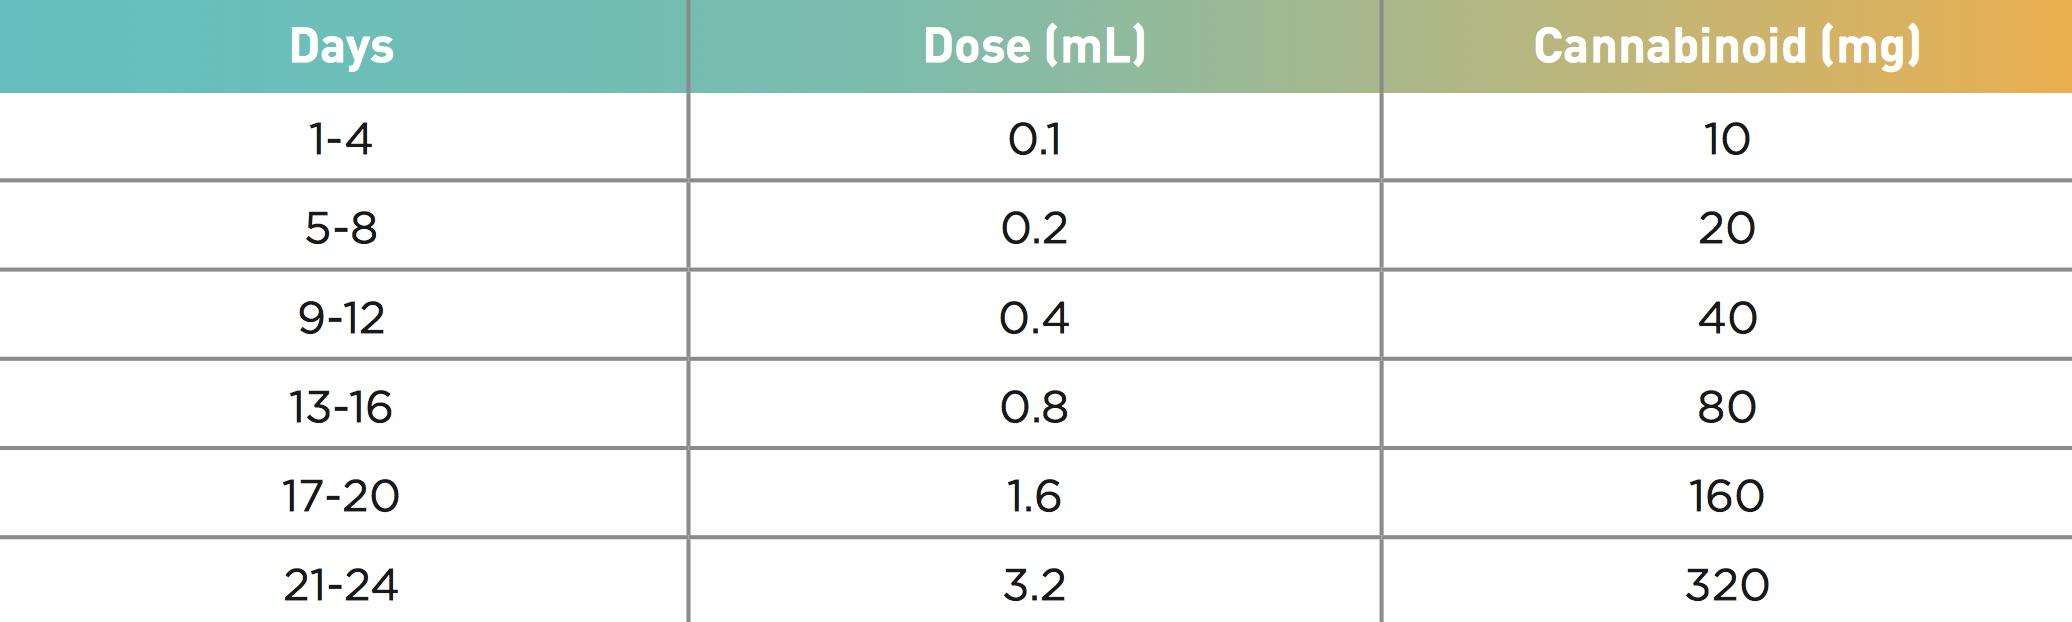 dosing-guide-1